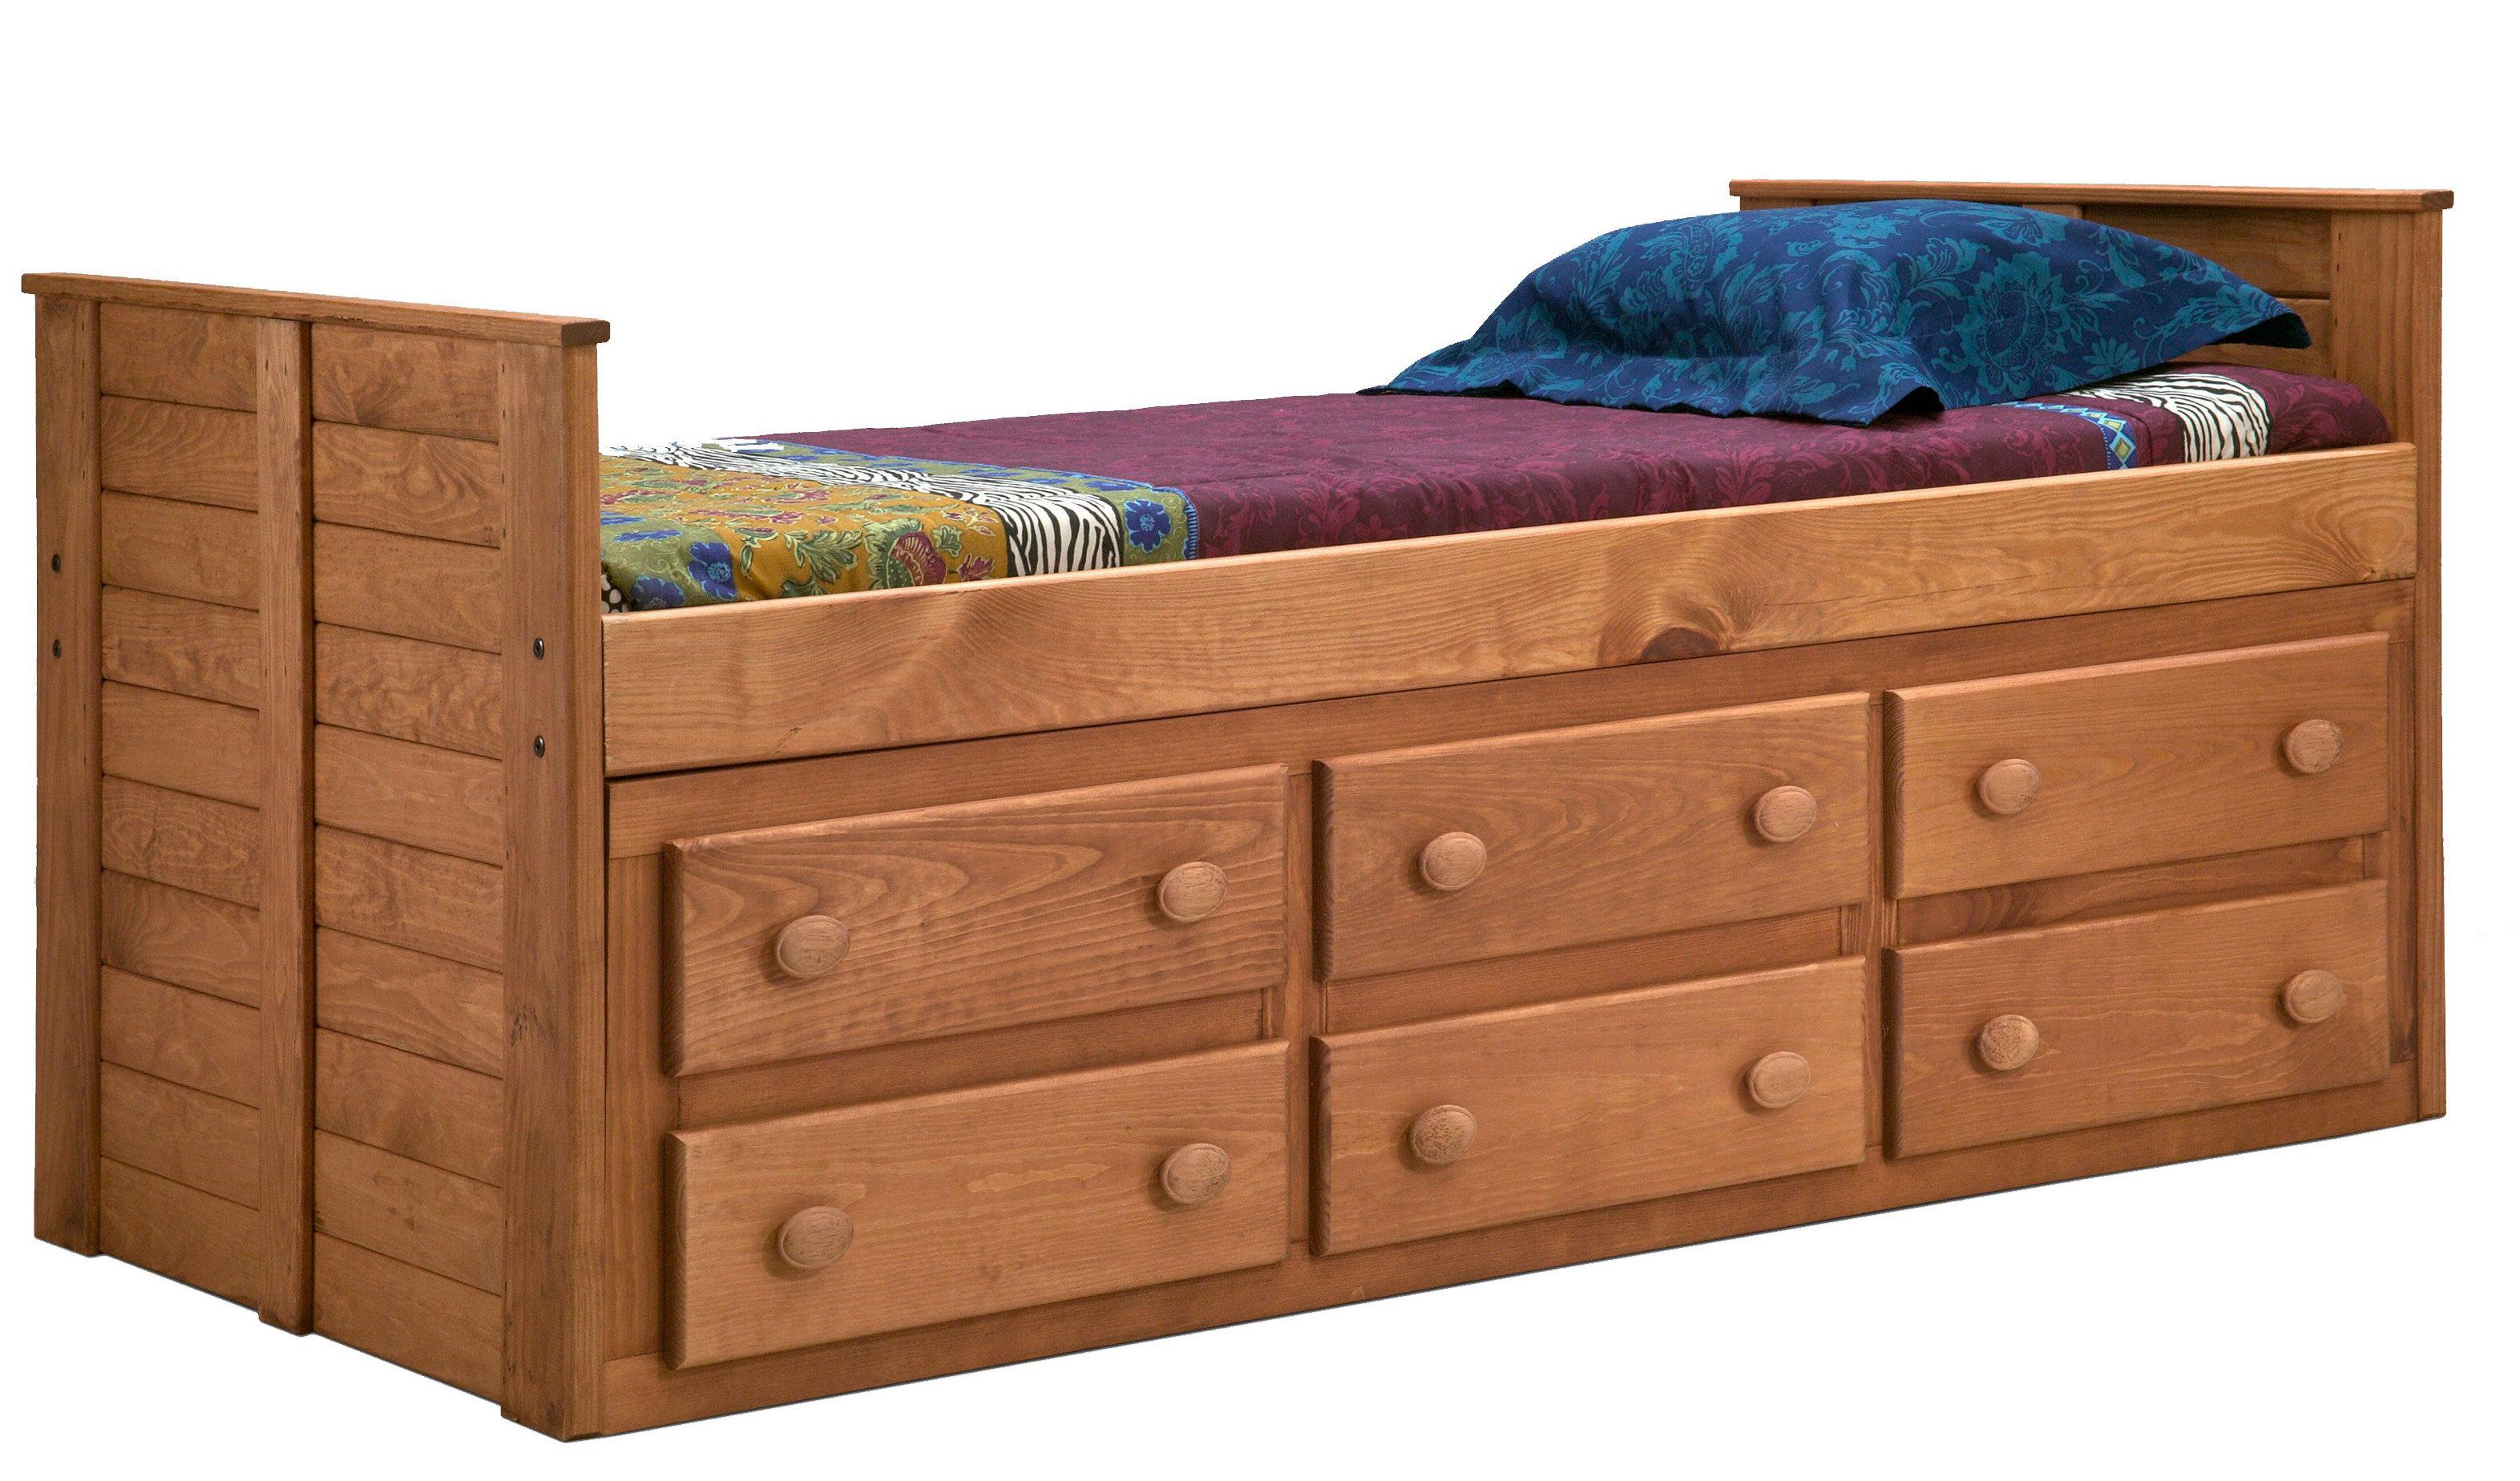 Harriet Bee Chea Twin Mate's & Captain's Bed with Storage | Wayfair